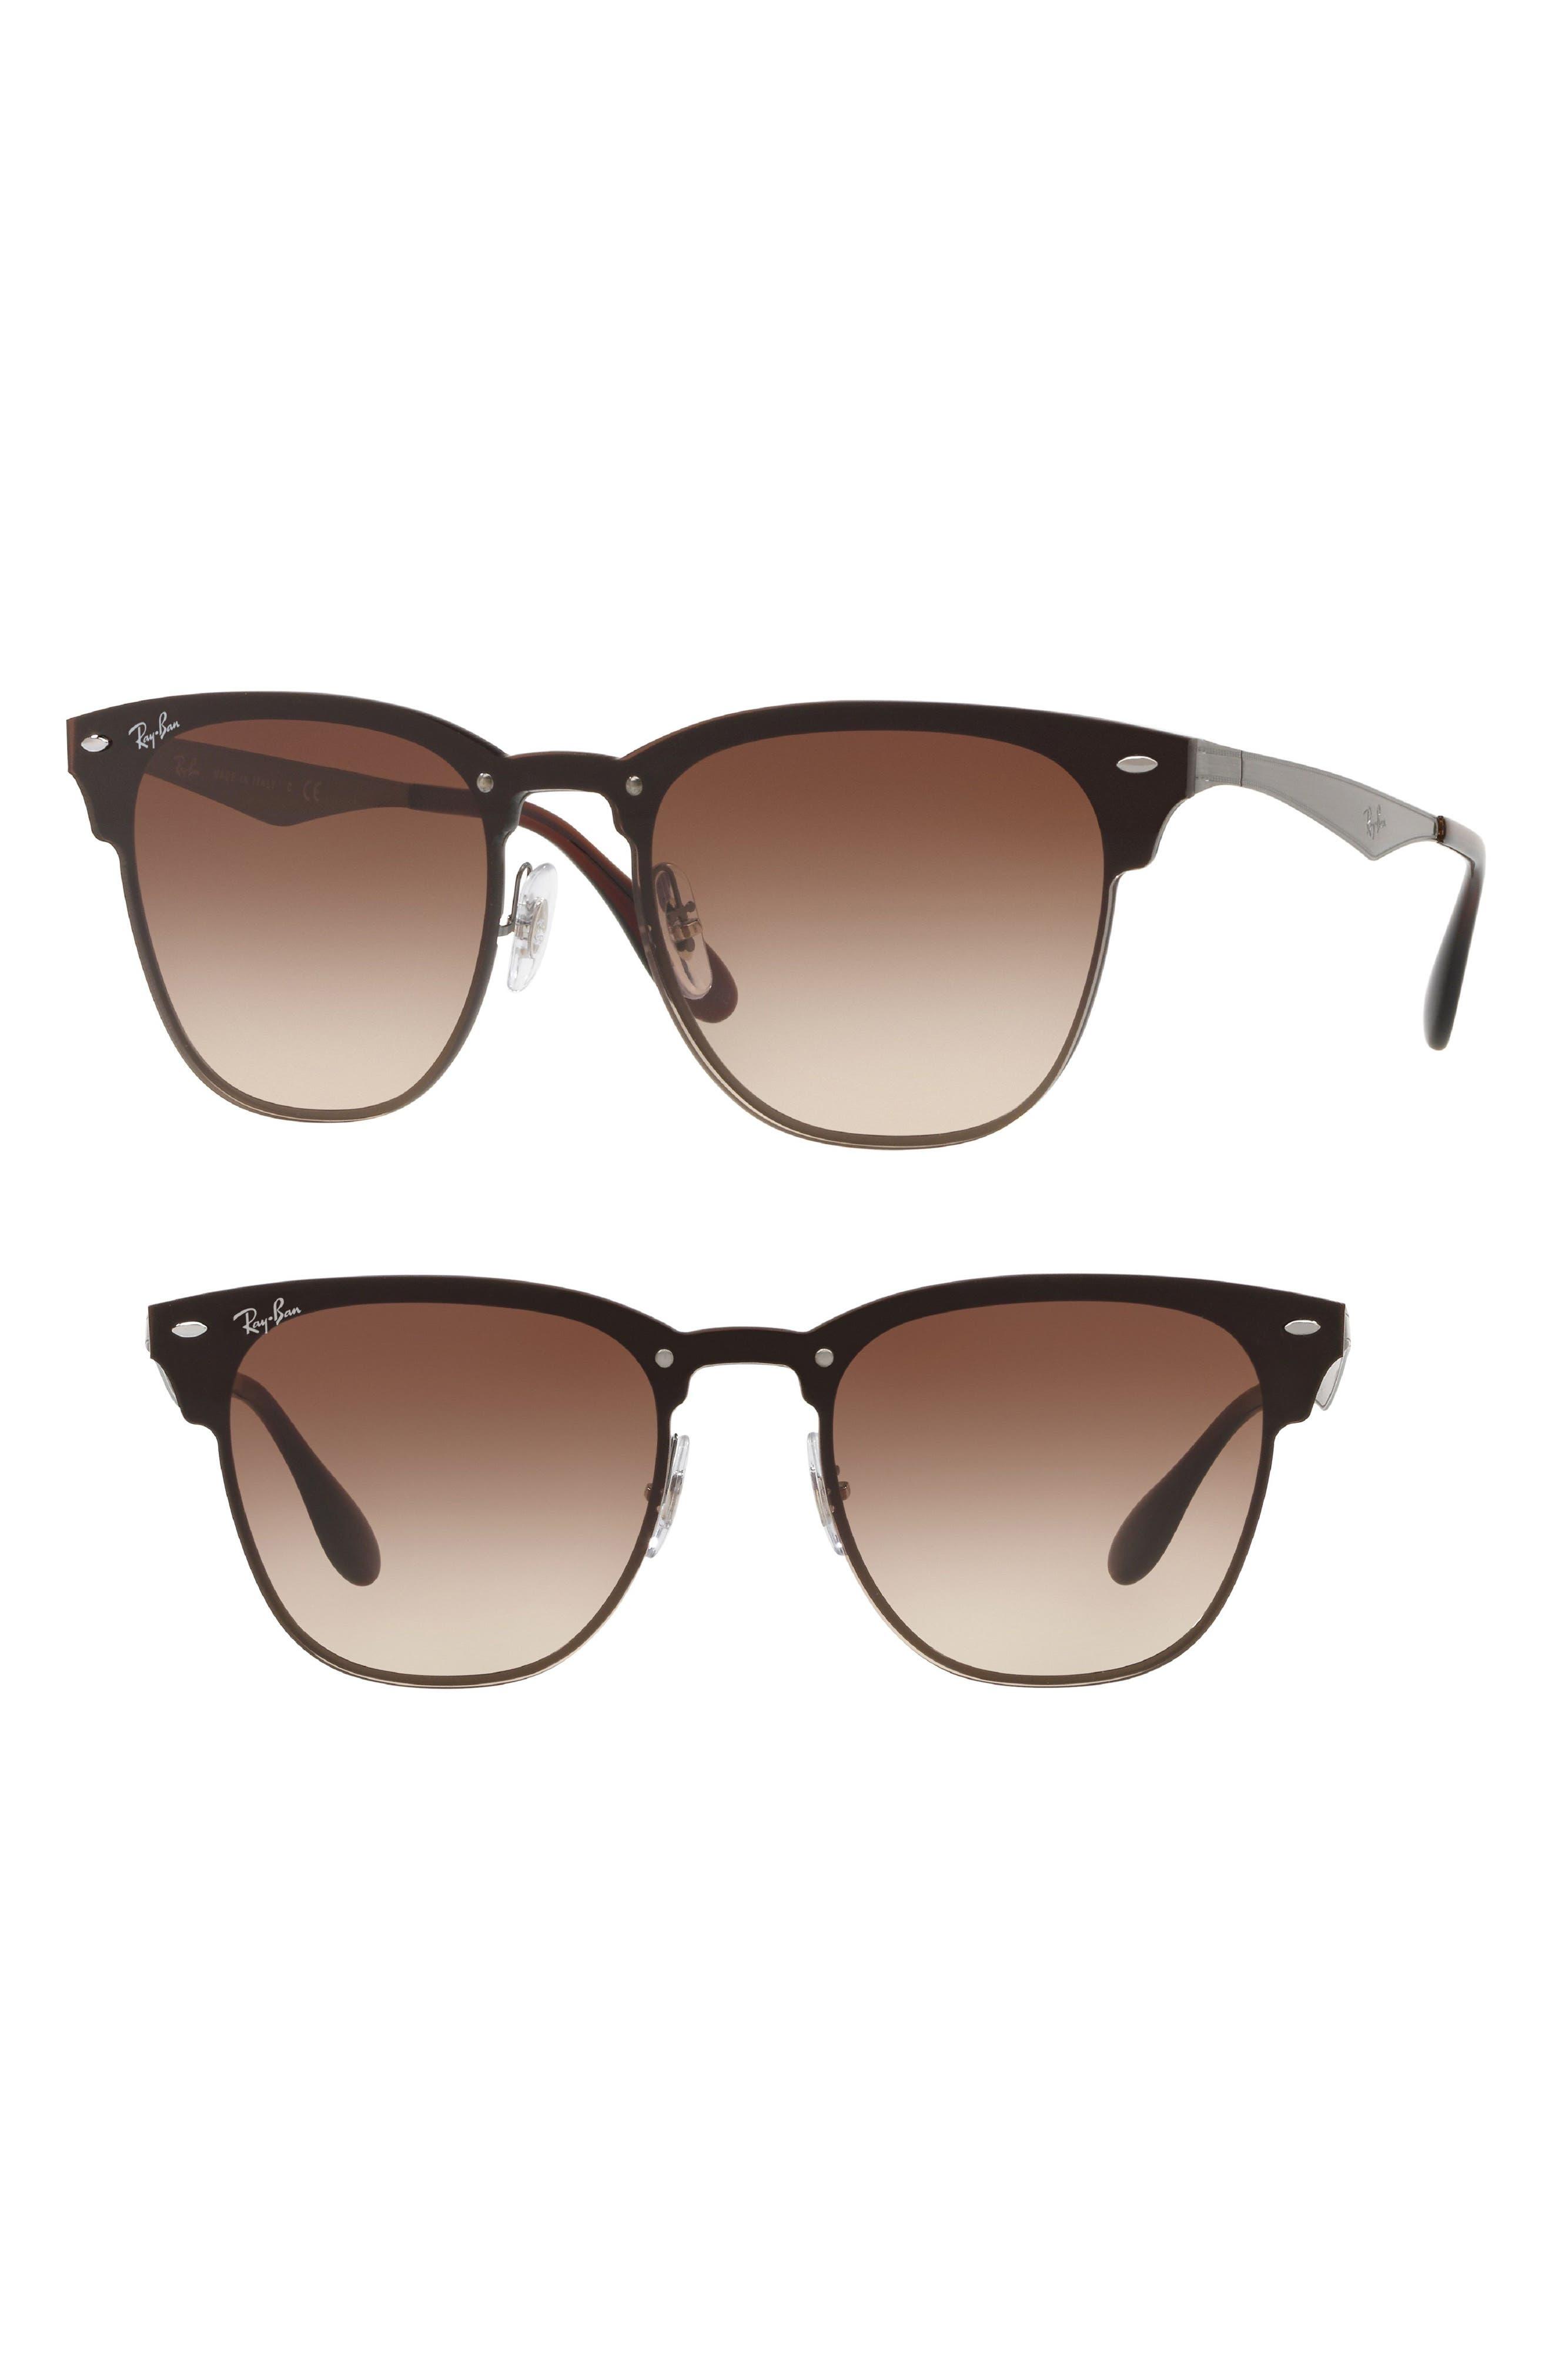 Blaze Clubmaster 47mm Sunglasses,                             Main thumbnail 1, color,                             Gunmetal